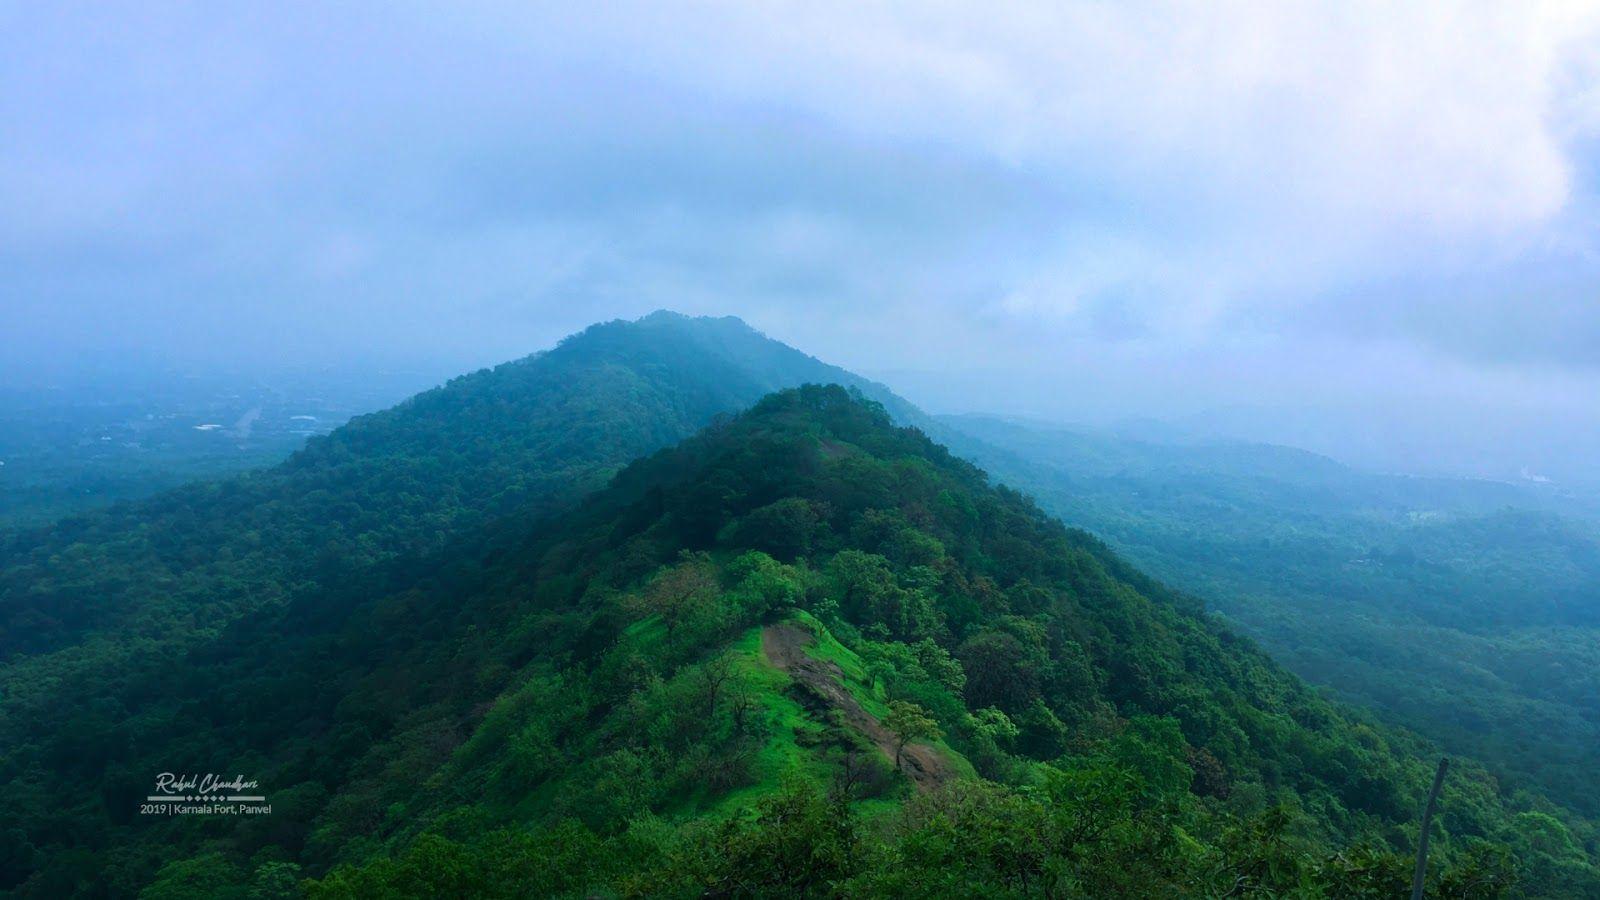 Hill 03 Karnala Fort Panvel India